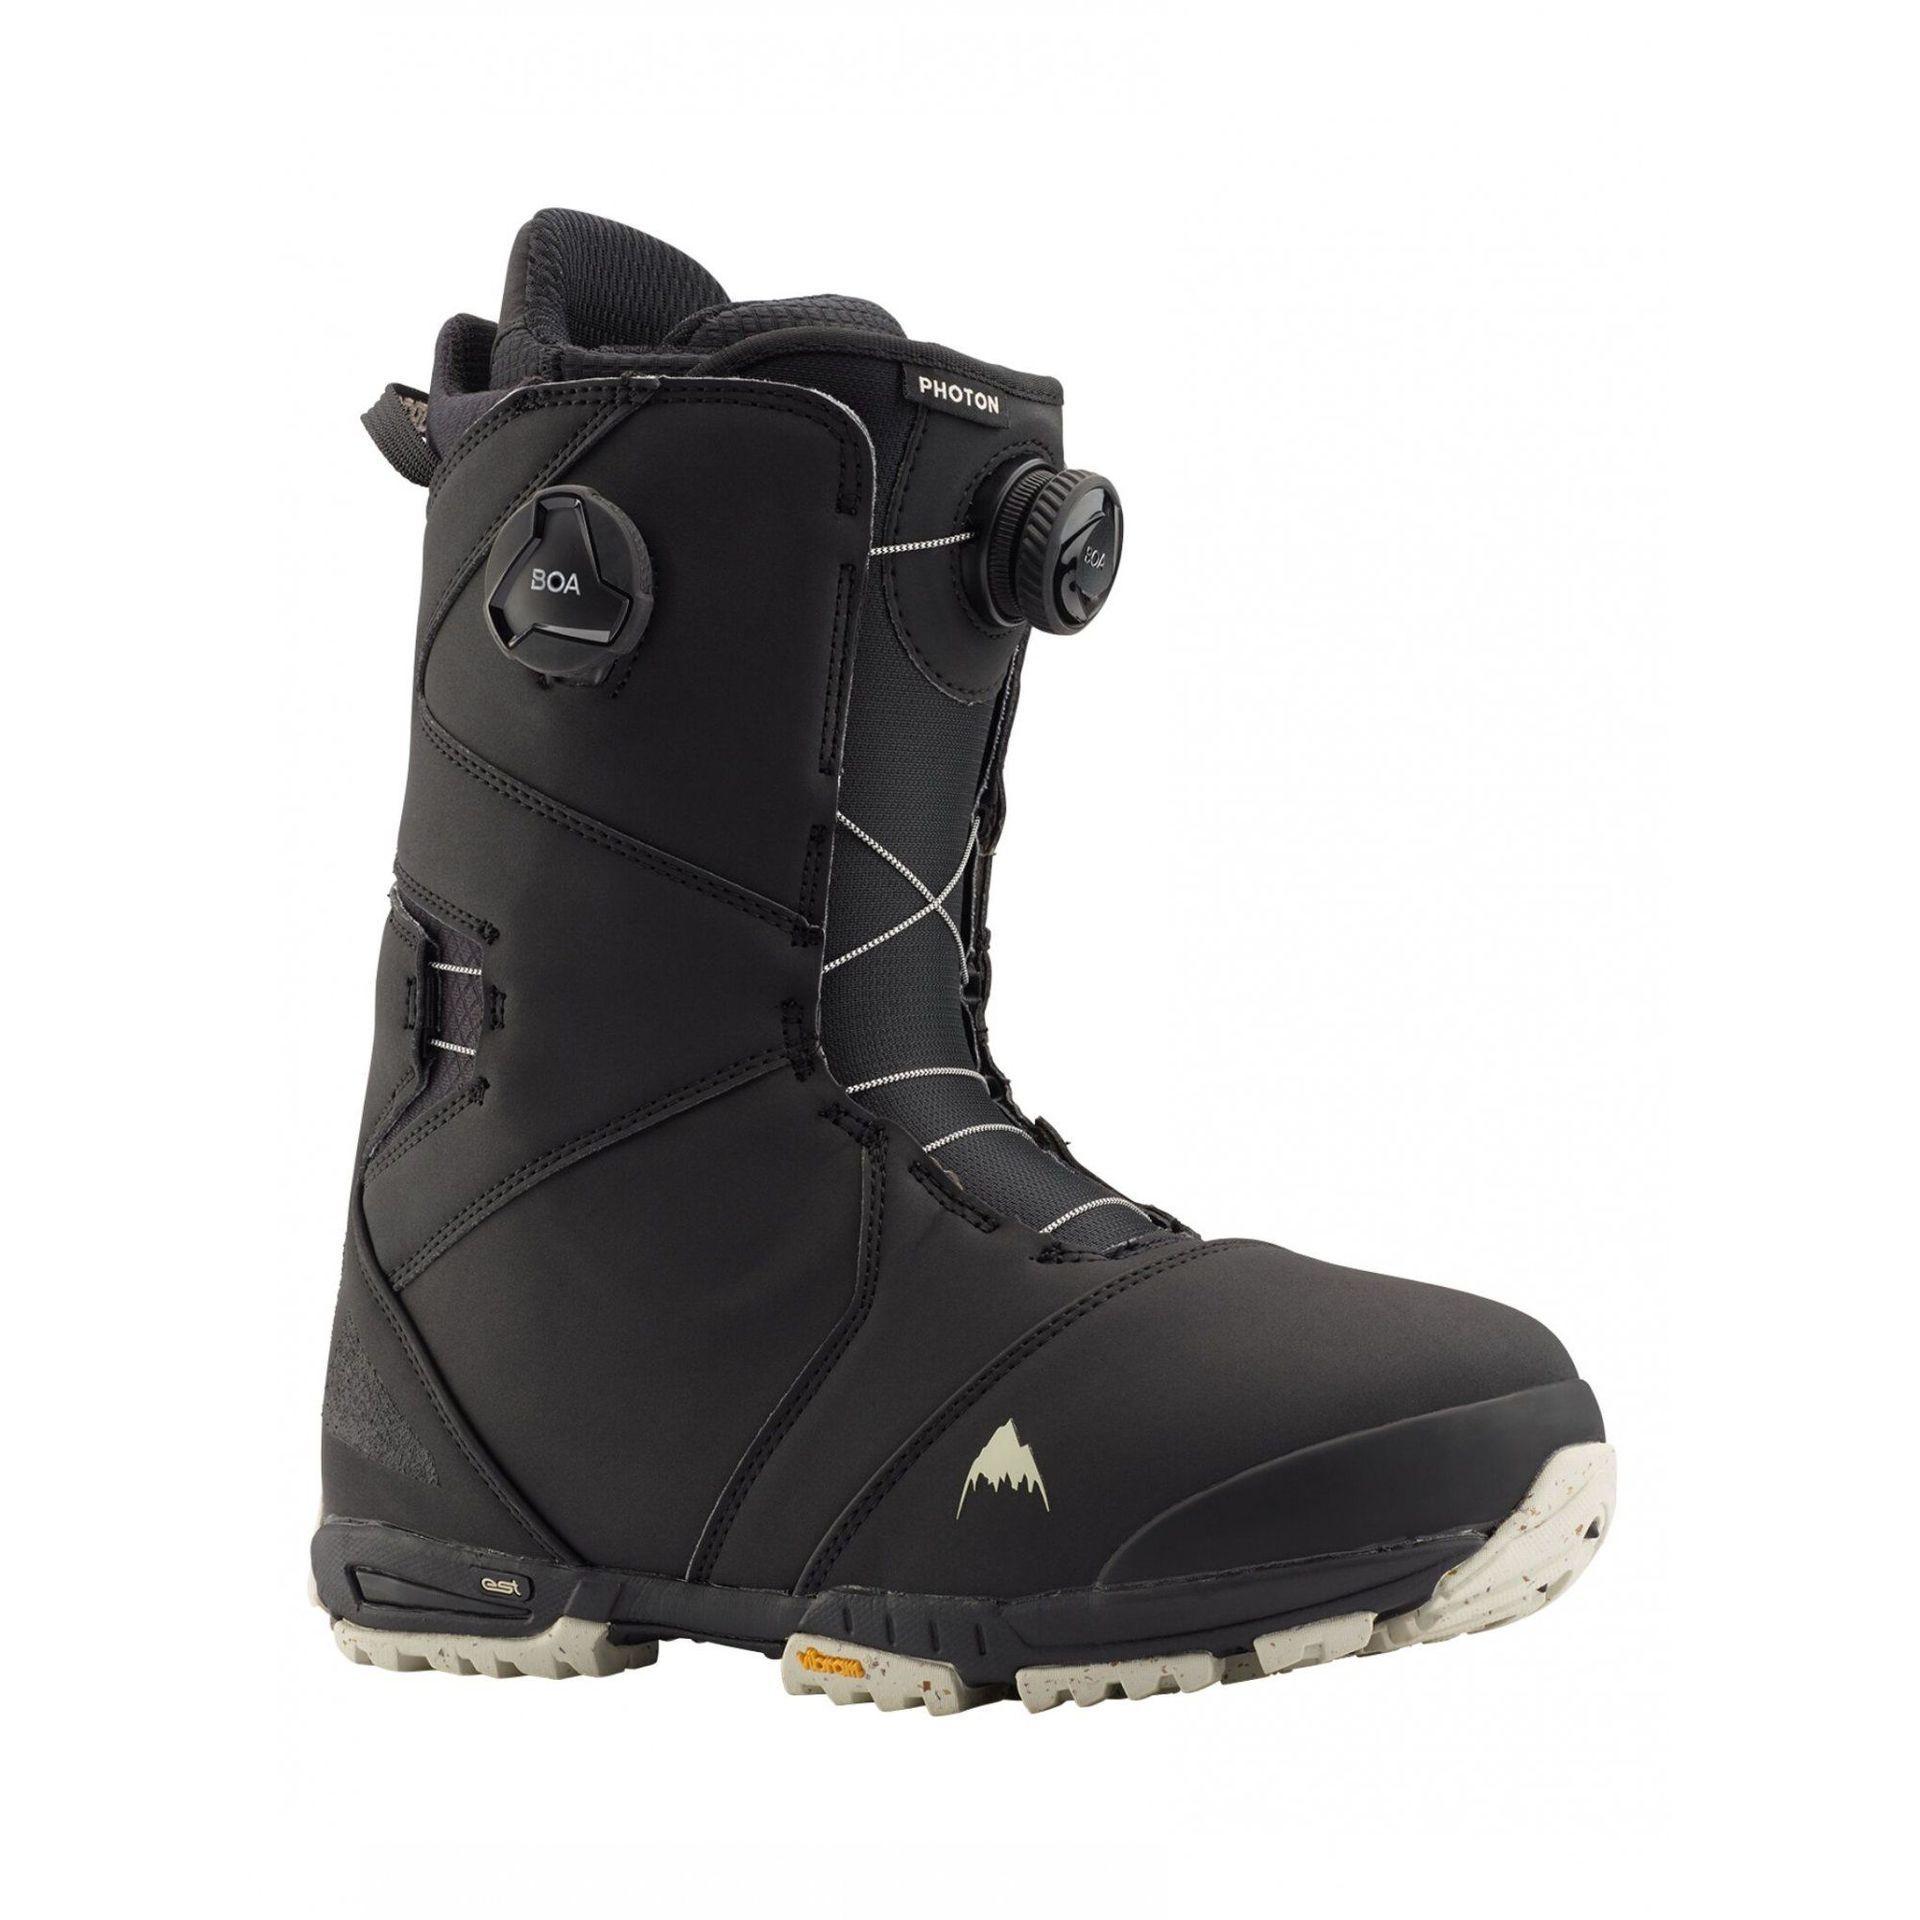 BUTY SNOWBOARDOWE BURTON PHOTON BOA BLK 150861-001 1